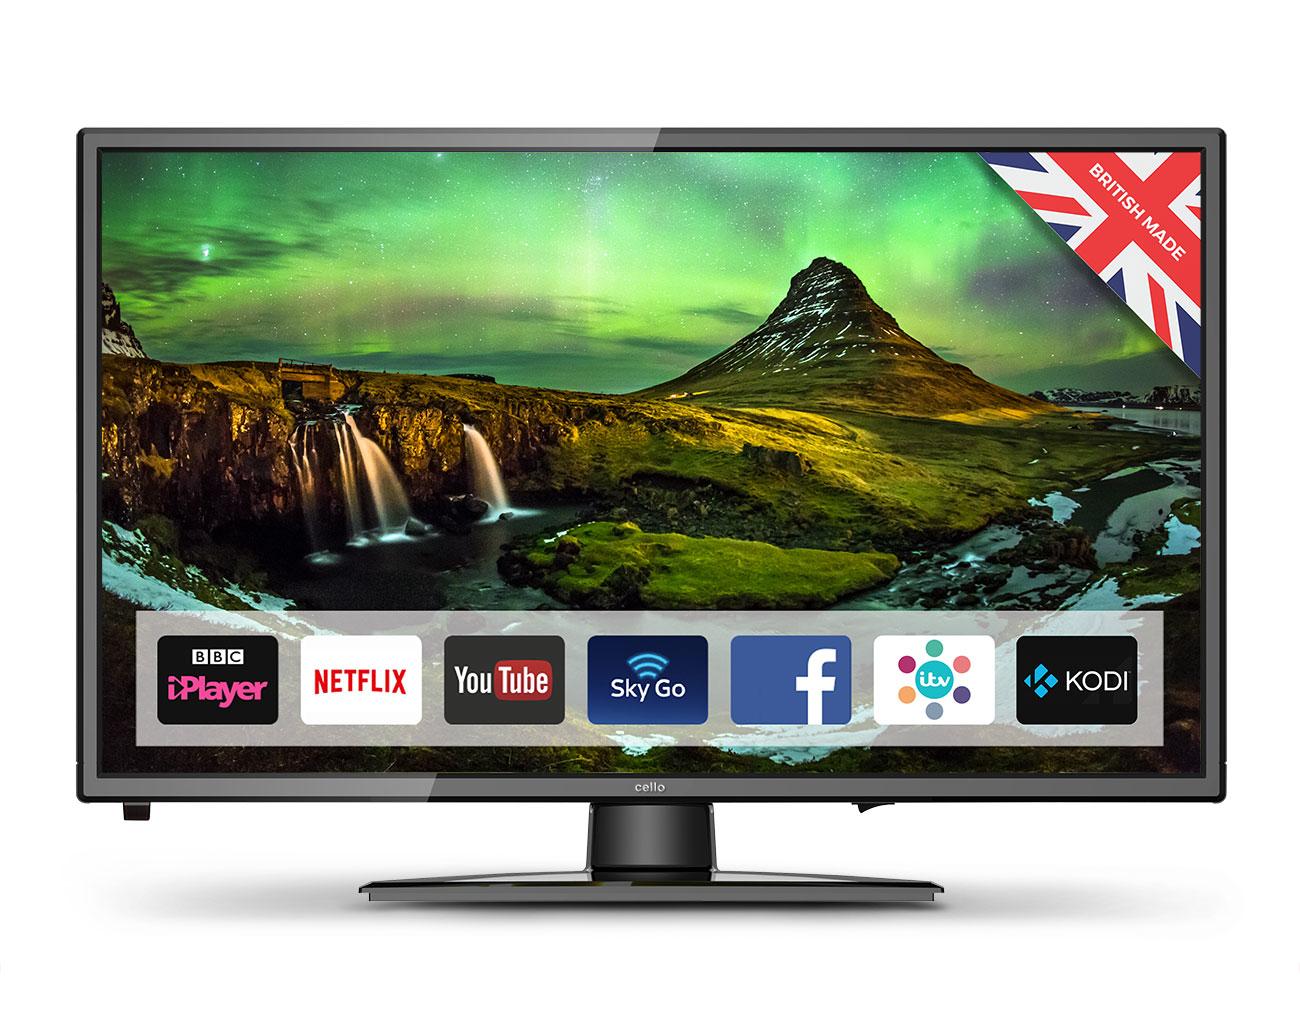 24IN LED 1366X768 16:9 5MS C24SFS 3000:1 HDMI               IN